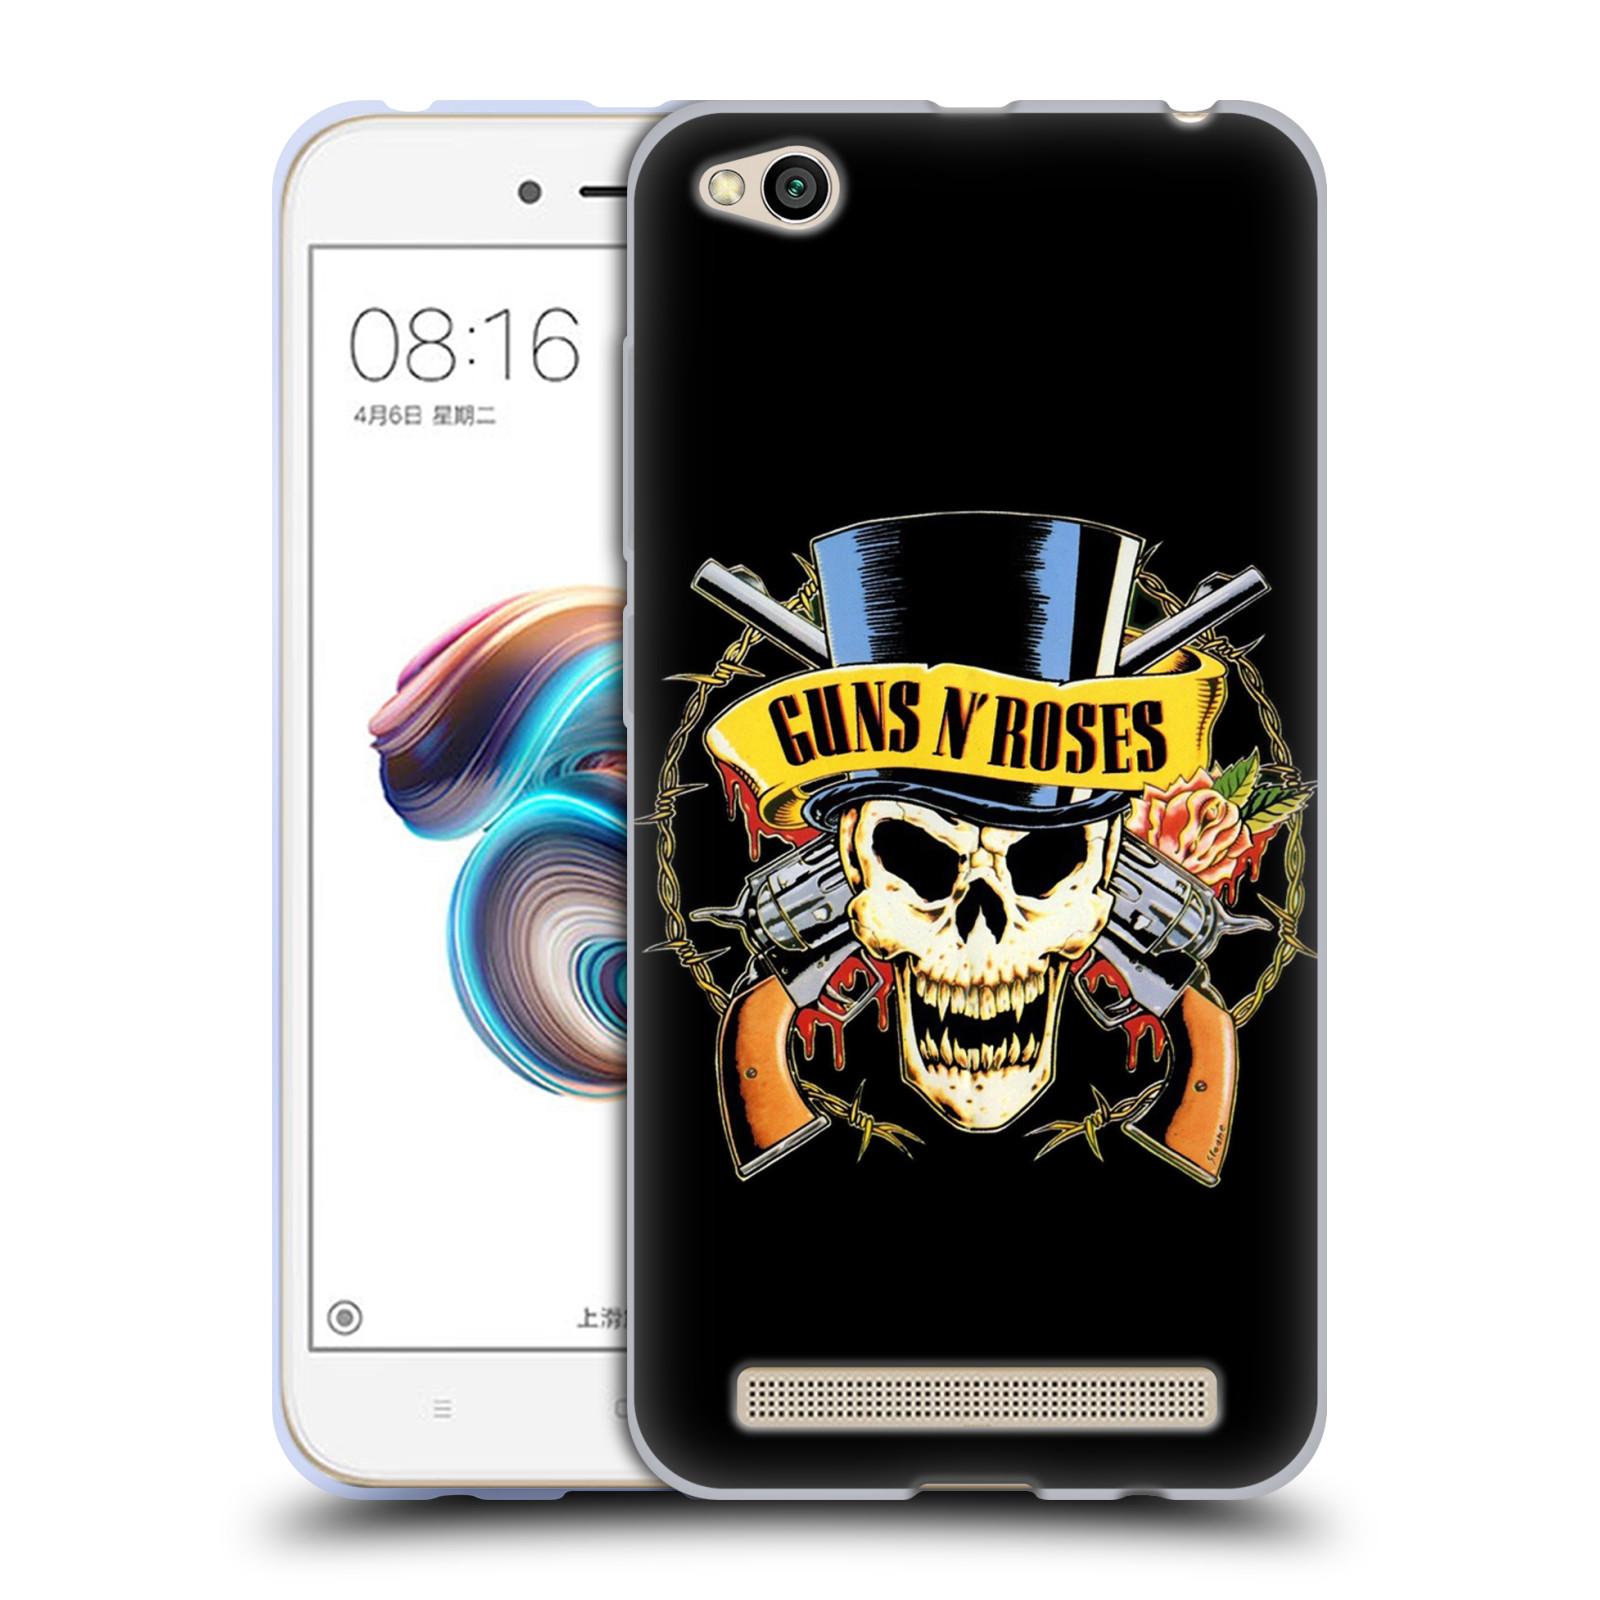 Silikonové pouzdro na mobil Xiaomi Redmi 5A - Head Case - Guns N' Roses - Lebka